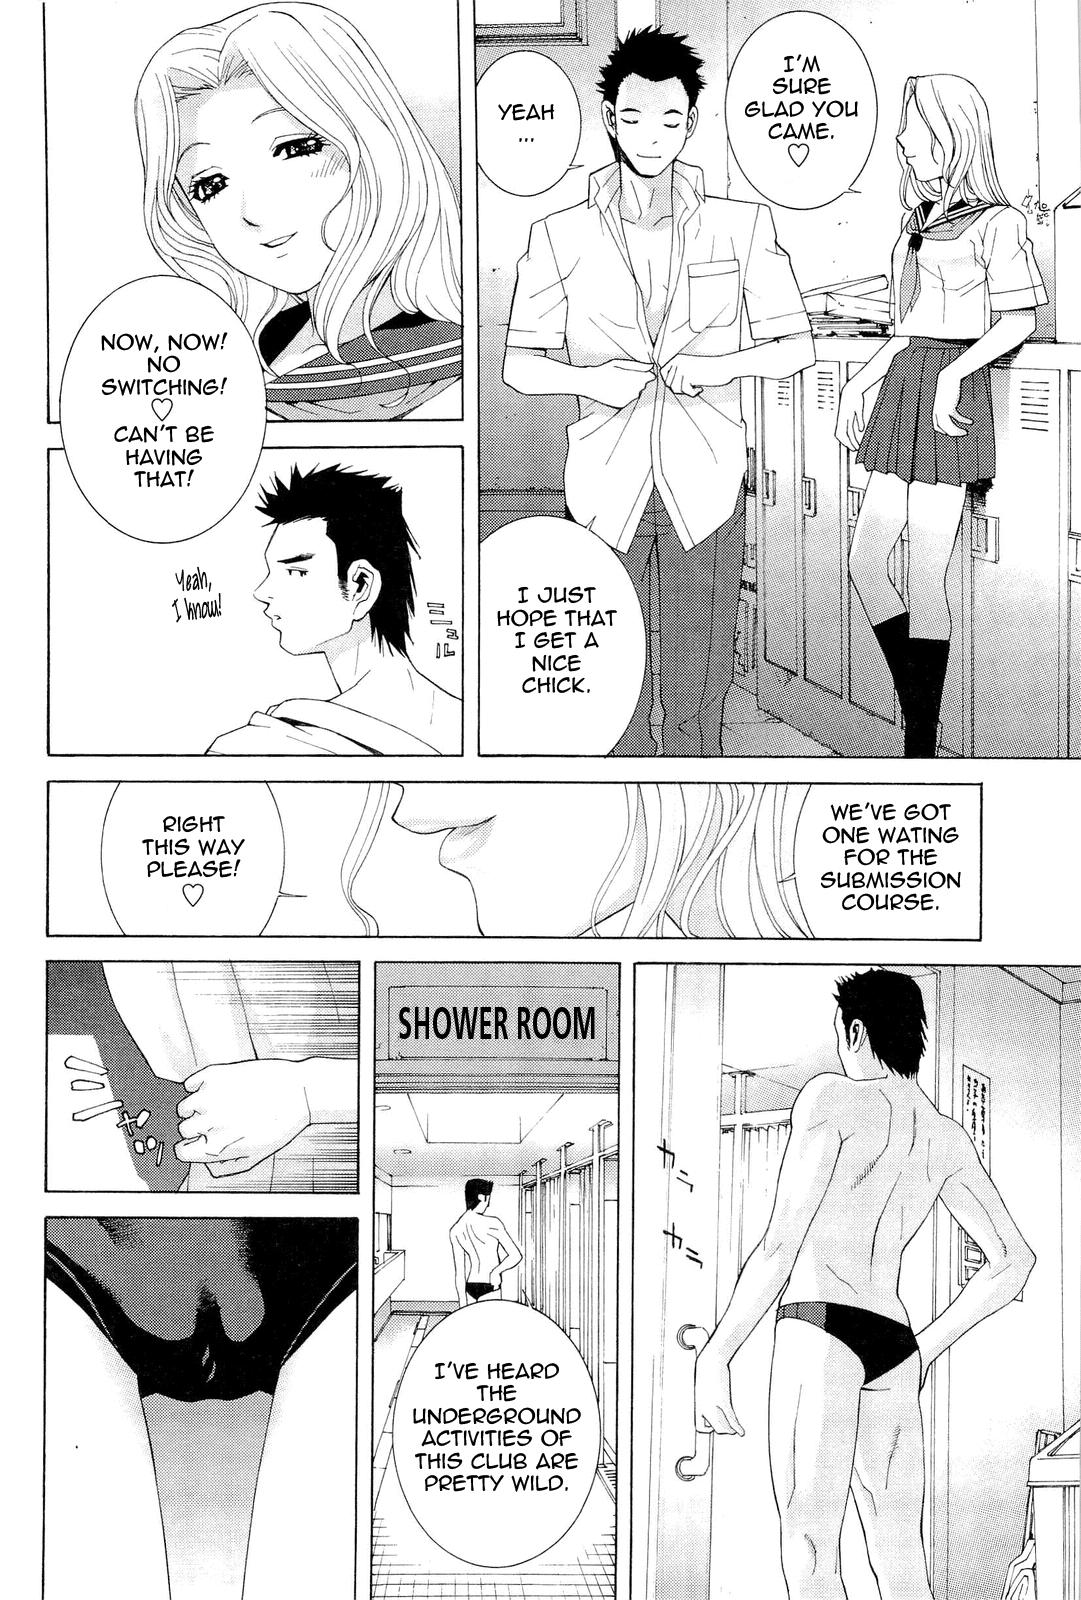 [Shinobu Tanei] Ane ♡ Imouto Love | Big-Sis Lil-Sis Love [English] {Tadanohito} 184